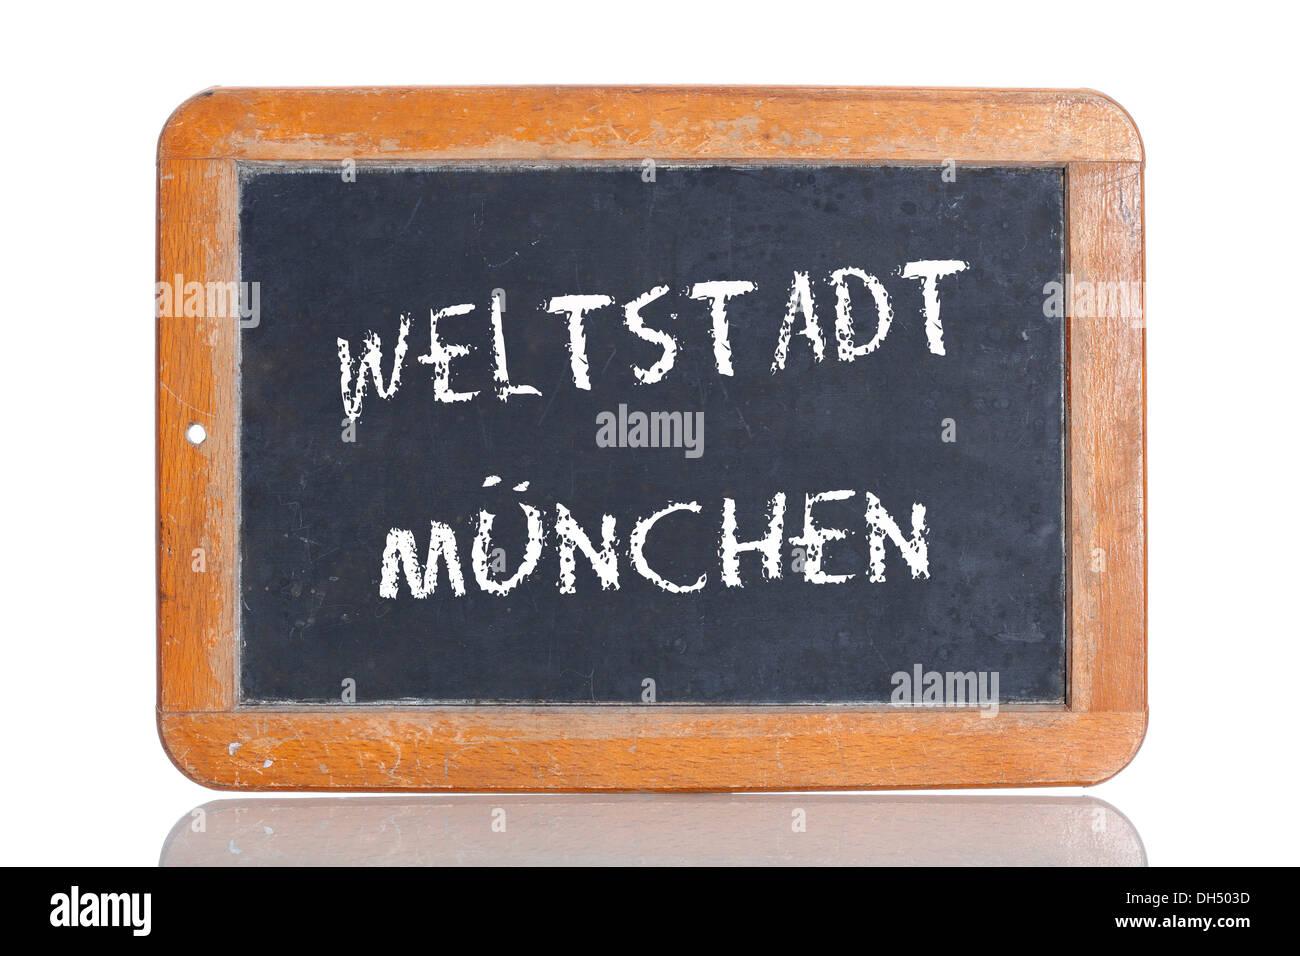 Old chalkboard, lettering 'WELTSTADT MUENCHEN', German for 'WORLD CITY OF MUNICH' - Stock Image